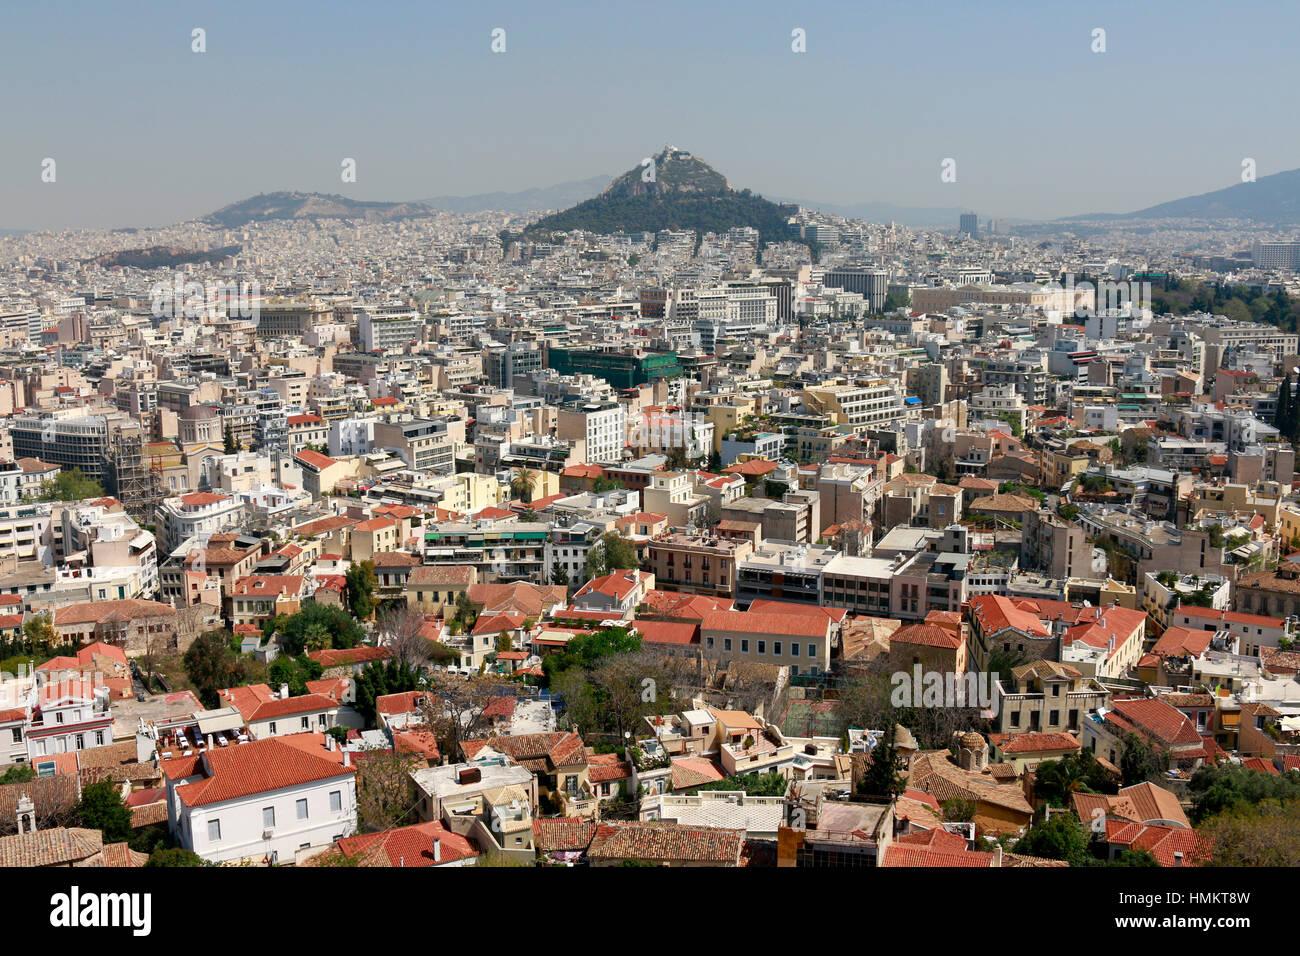 Skyline: Lykabettus/ Lykavittos, Athen, Griechenland. Stock Photo